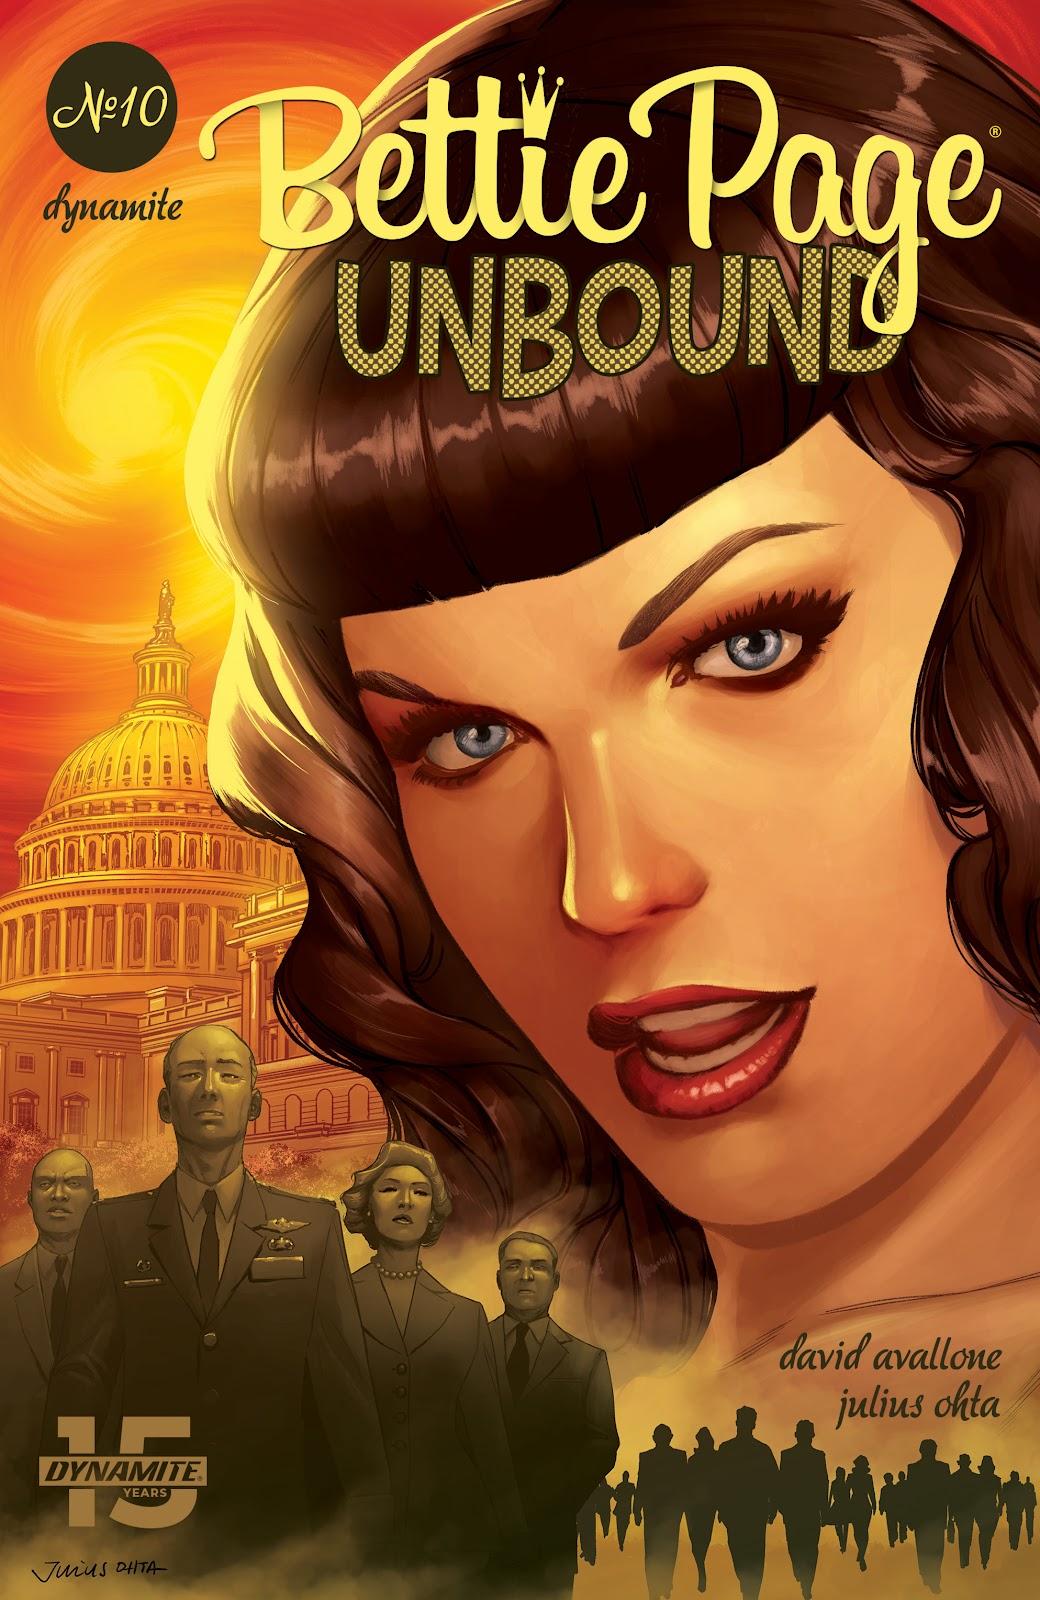 Read online Bettie Page: Unbound comic -  Issue #10 - 4